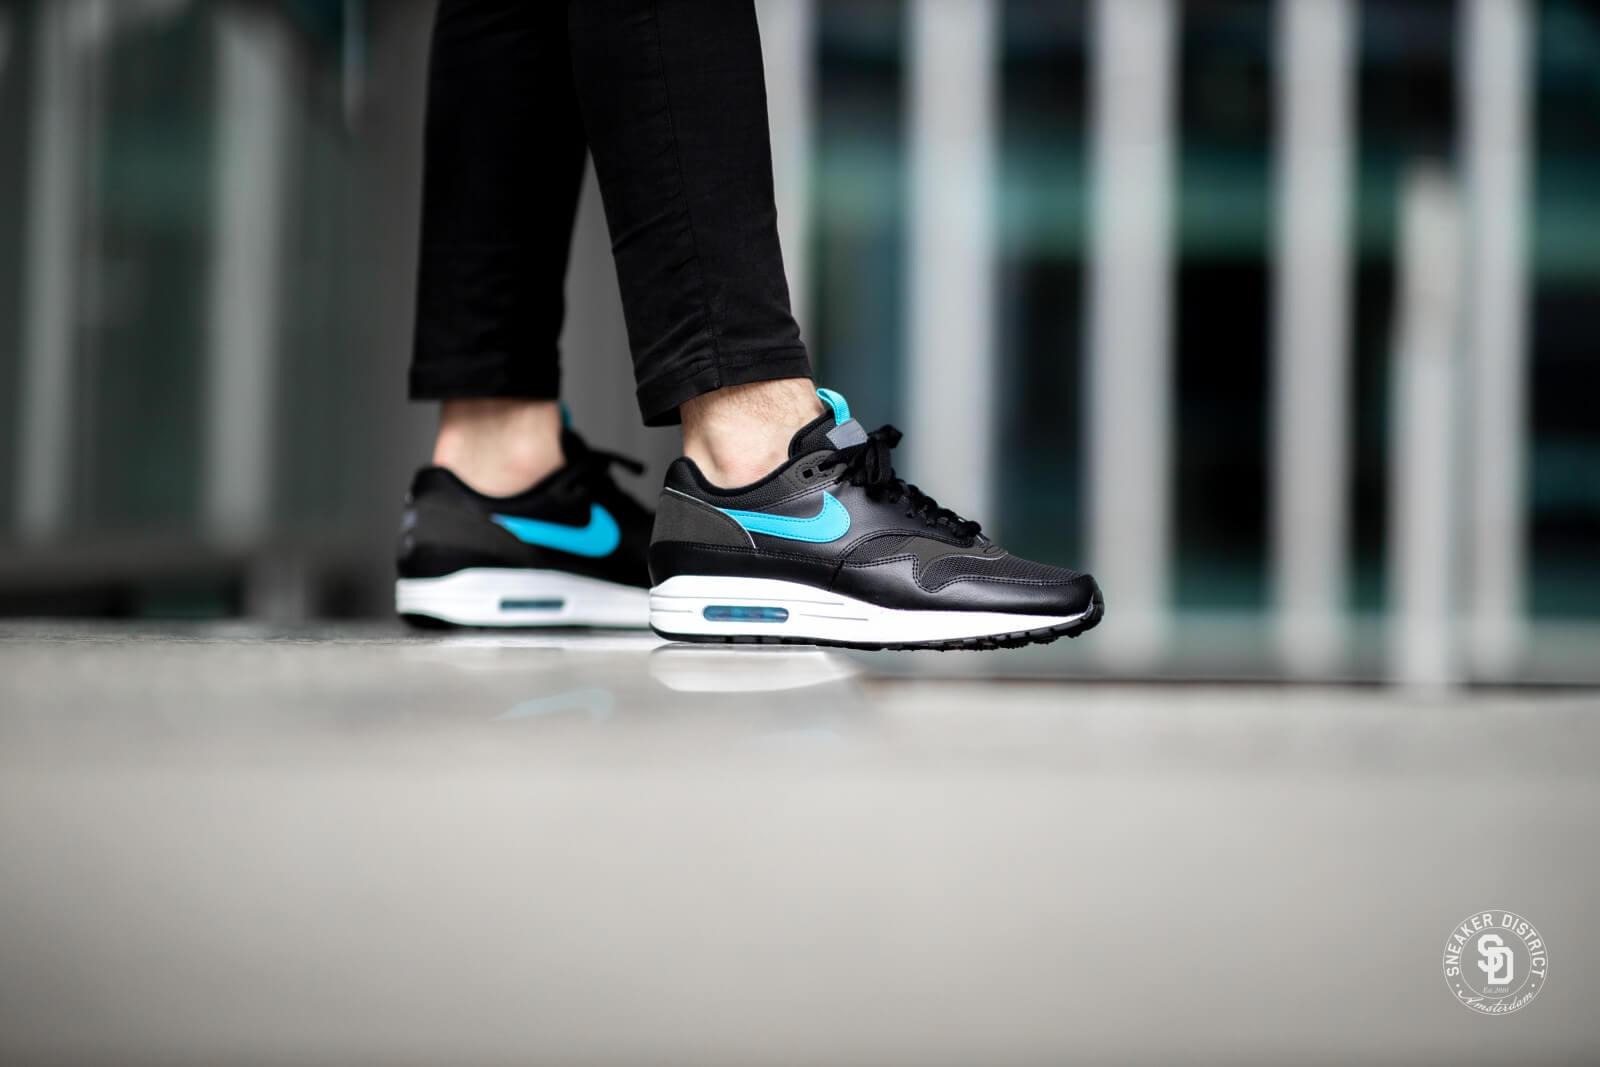 Nike Air Max 1 SE BlackBlue Fury CD1530 001